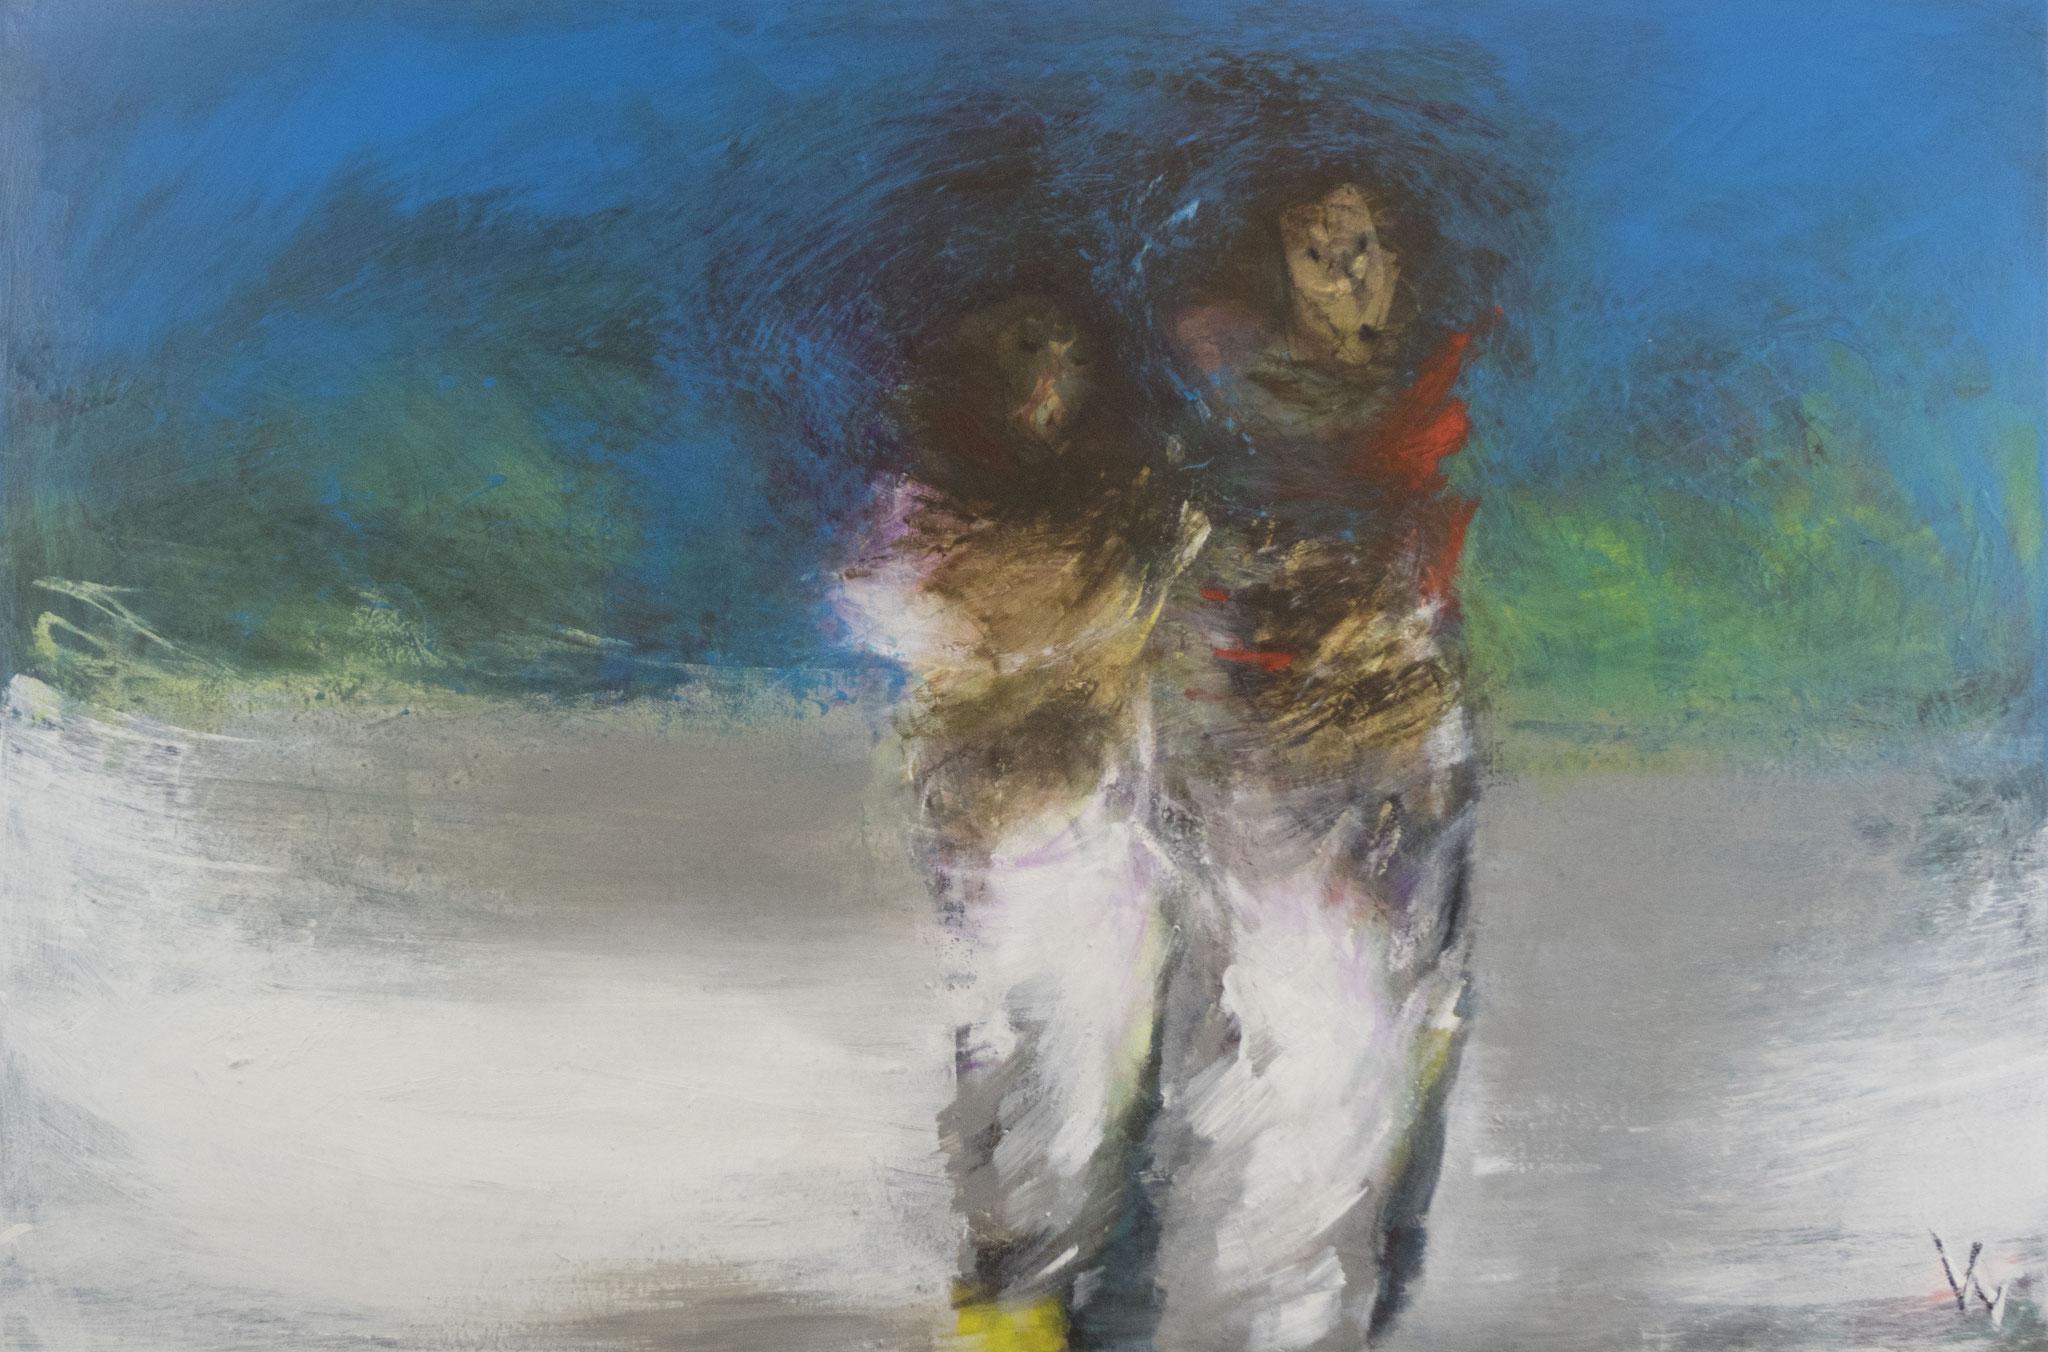 """4"" - Acryl auf Leinwand - 120x80 cm"